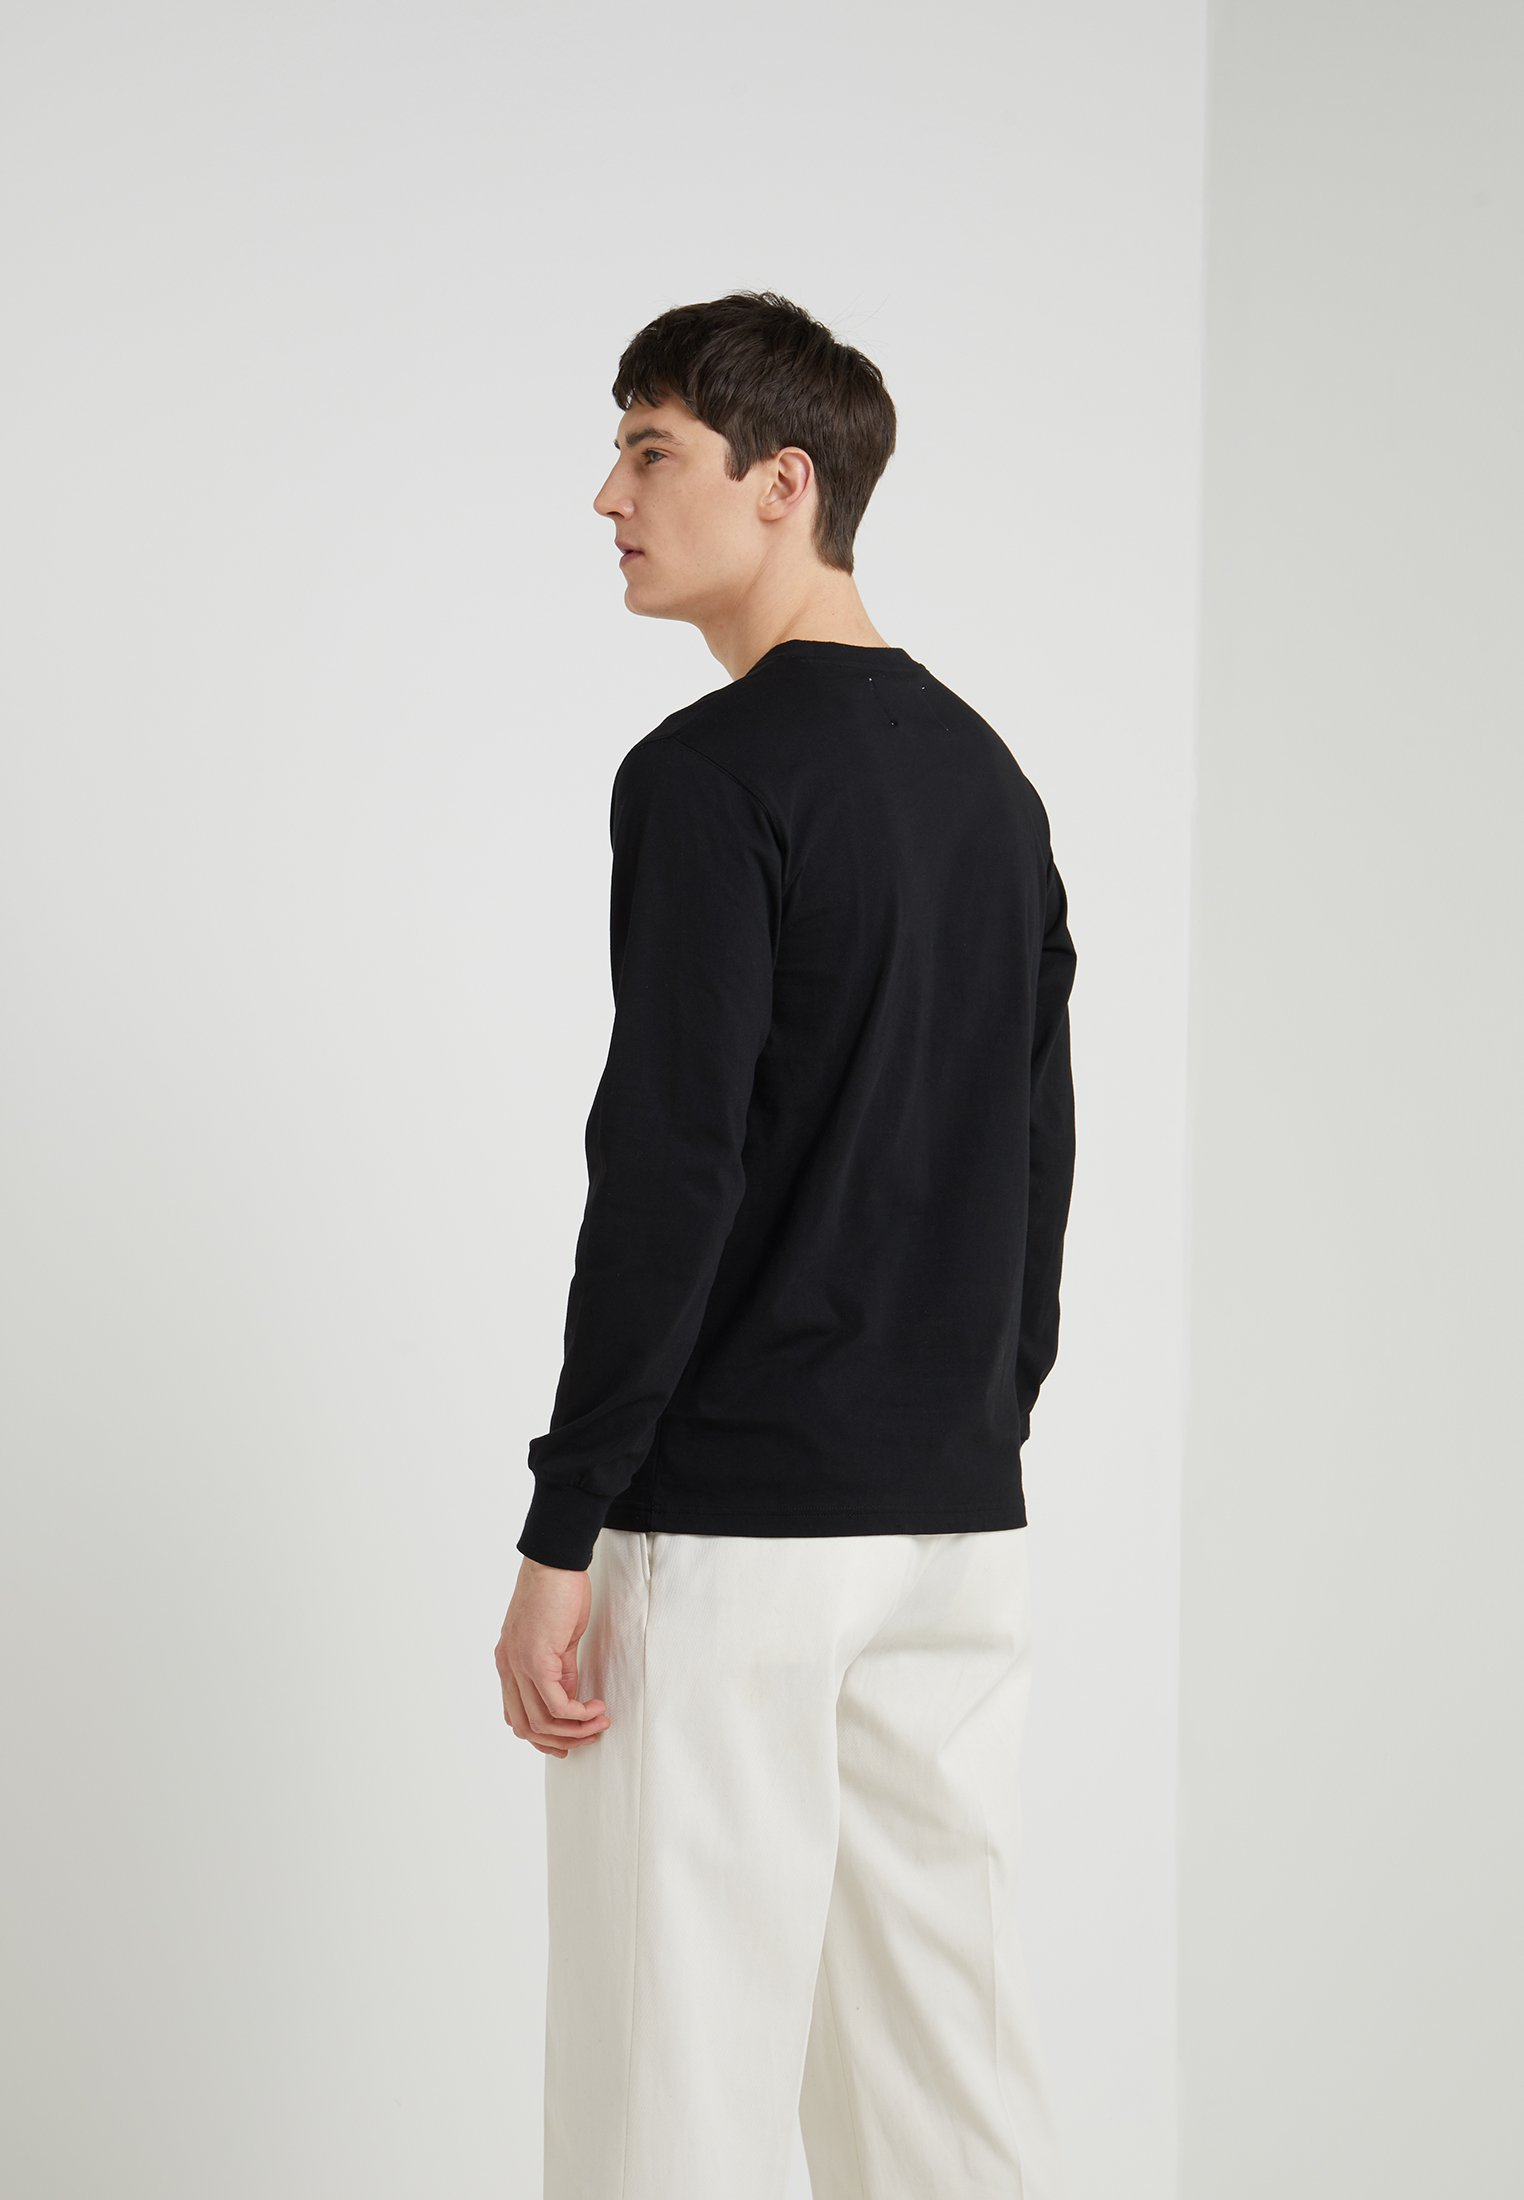 Han Kjobenhavn Casual Long Sleeve - Maglietta A Manica Lunga Black lW3hX